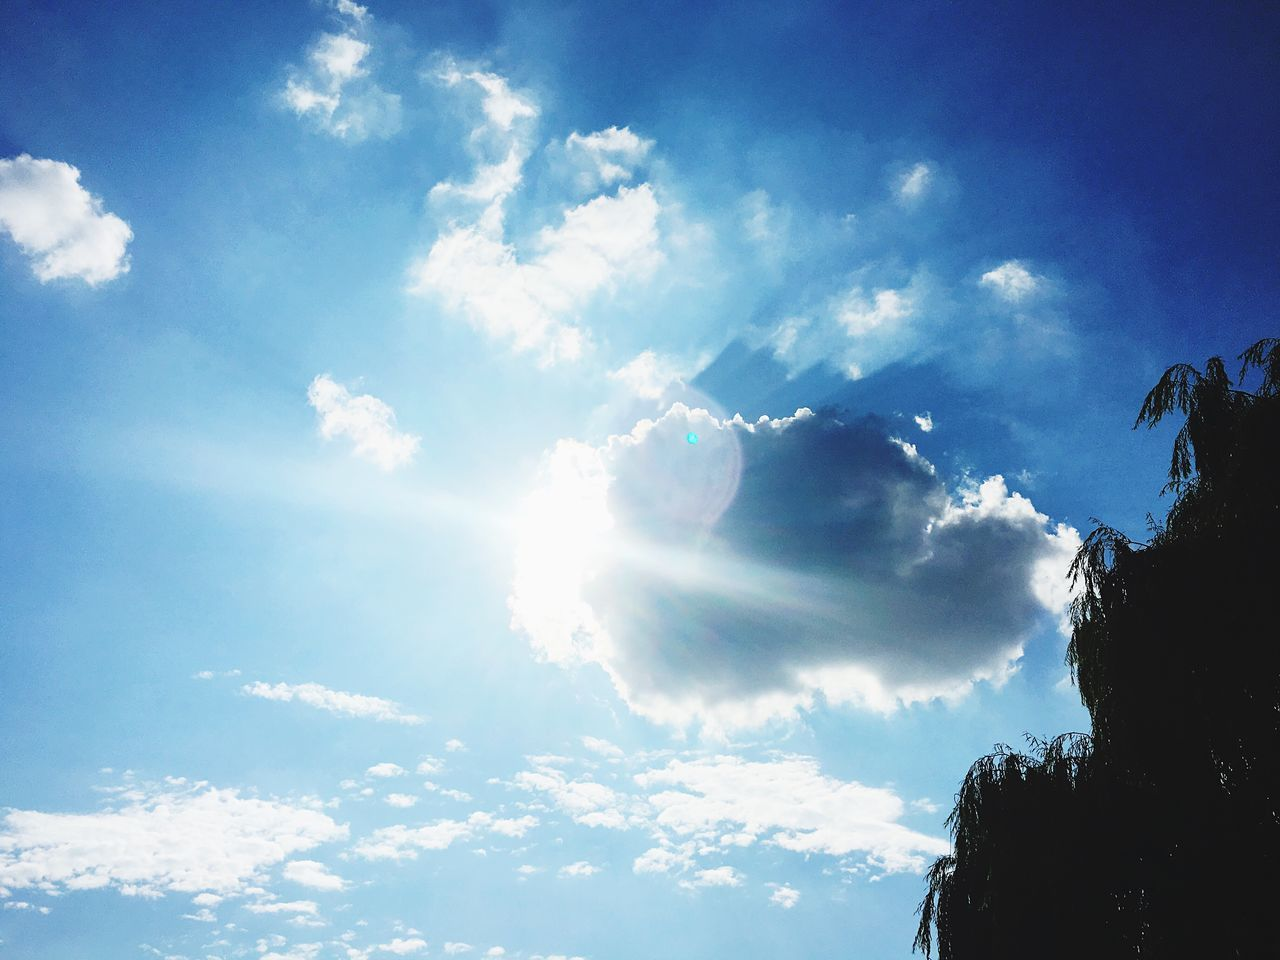 A wonderful day at the park. Awsomenature Wonderful Sky Awsome Day ♥ Beautiful Day Sunlight Sun Park Colour Of Life